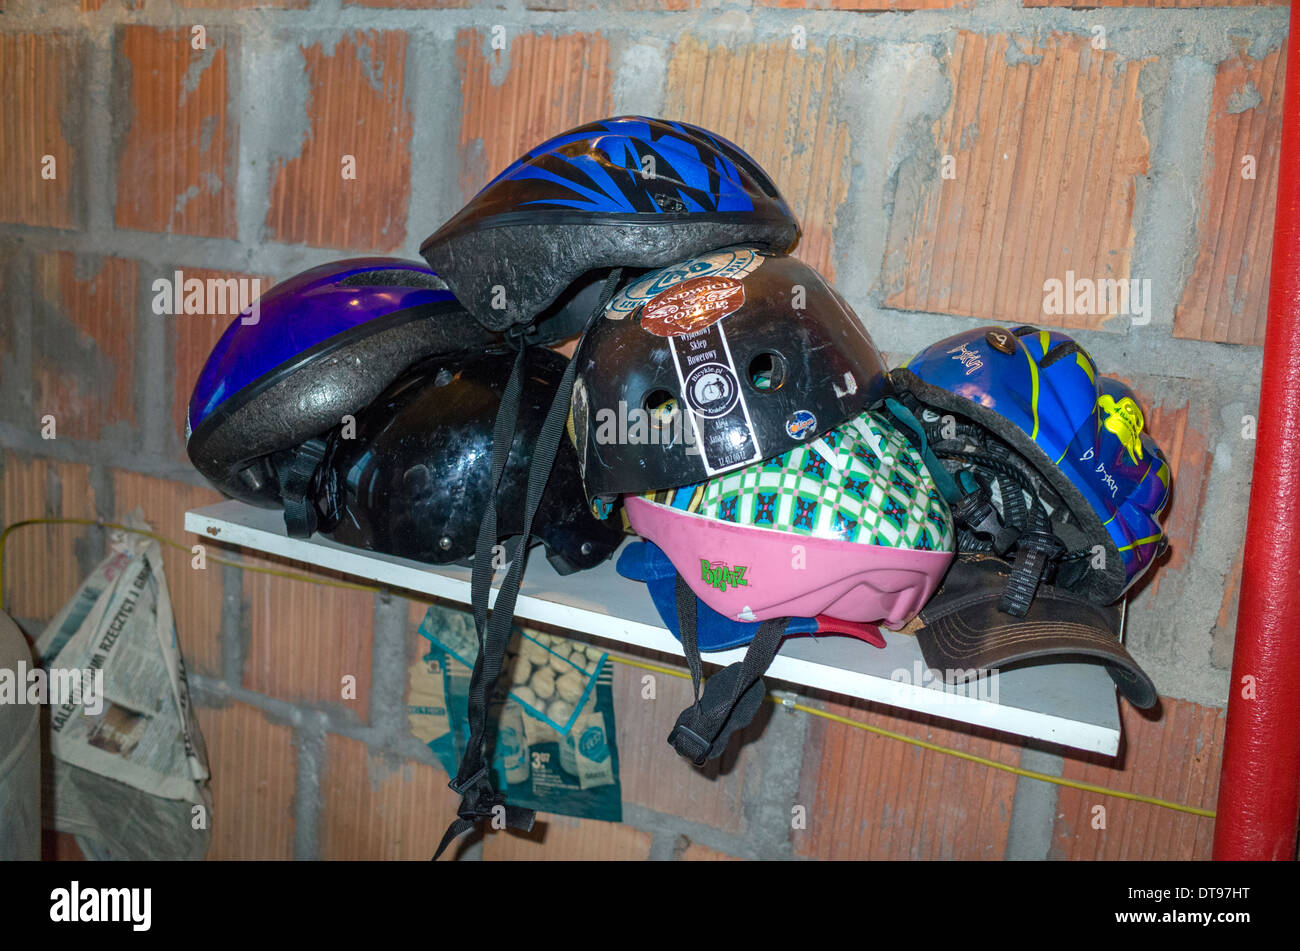 Storage Shelf Of Bicycle Safety Helmets. Zawady Central Poland